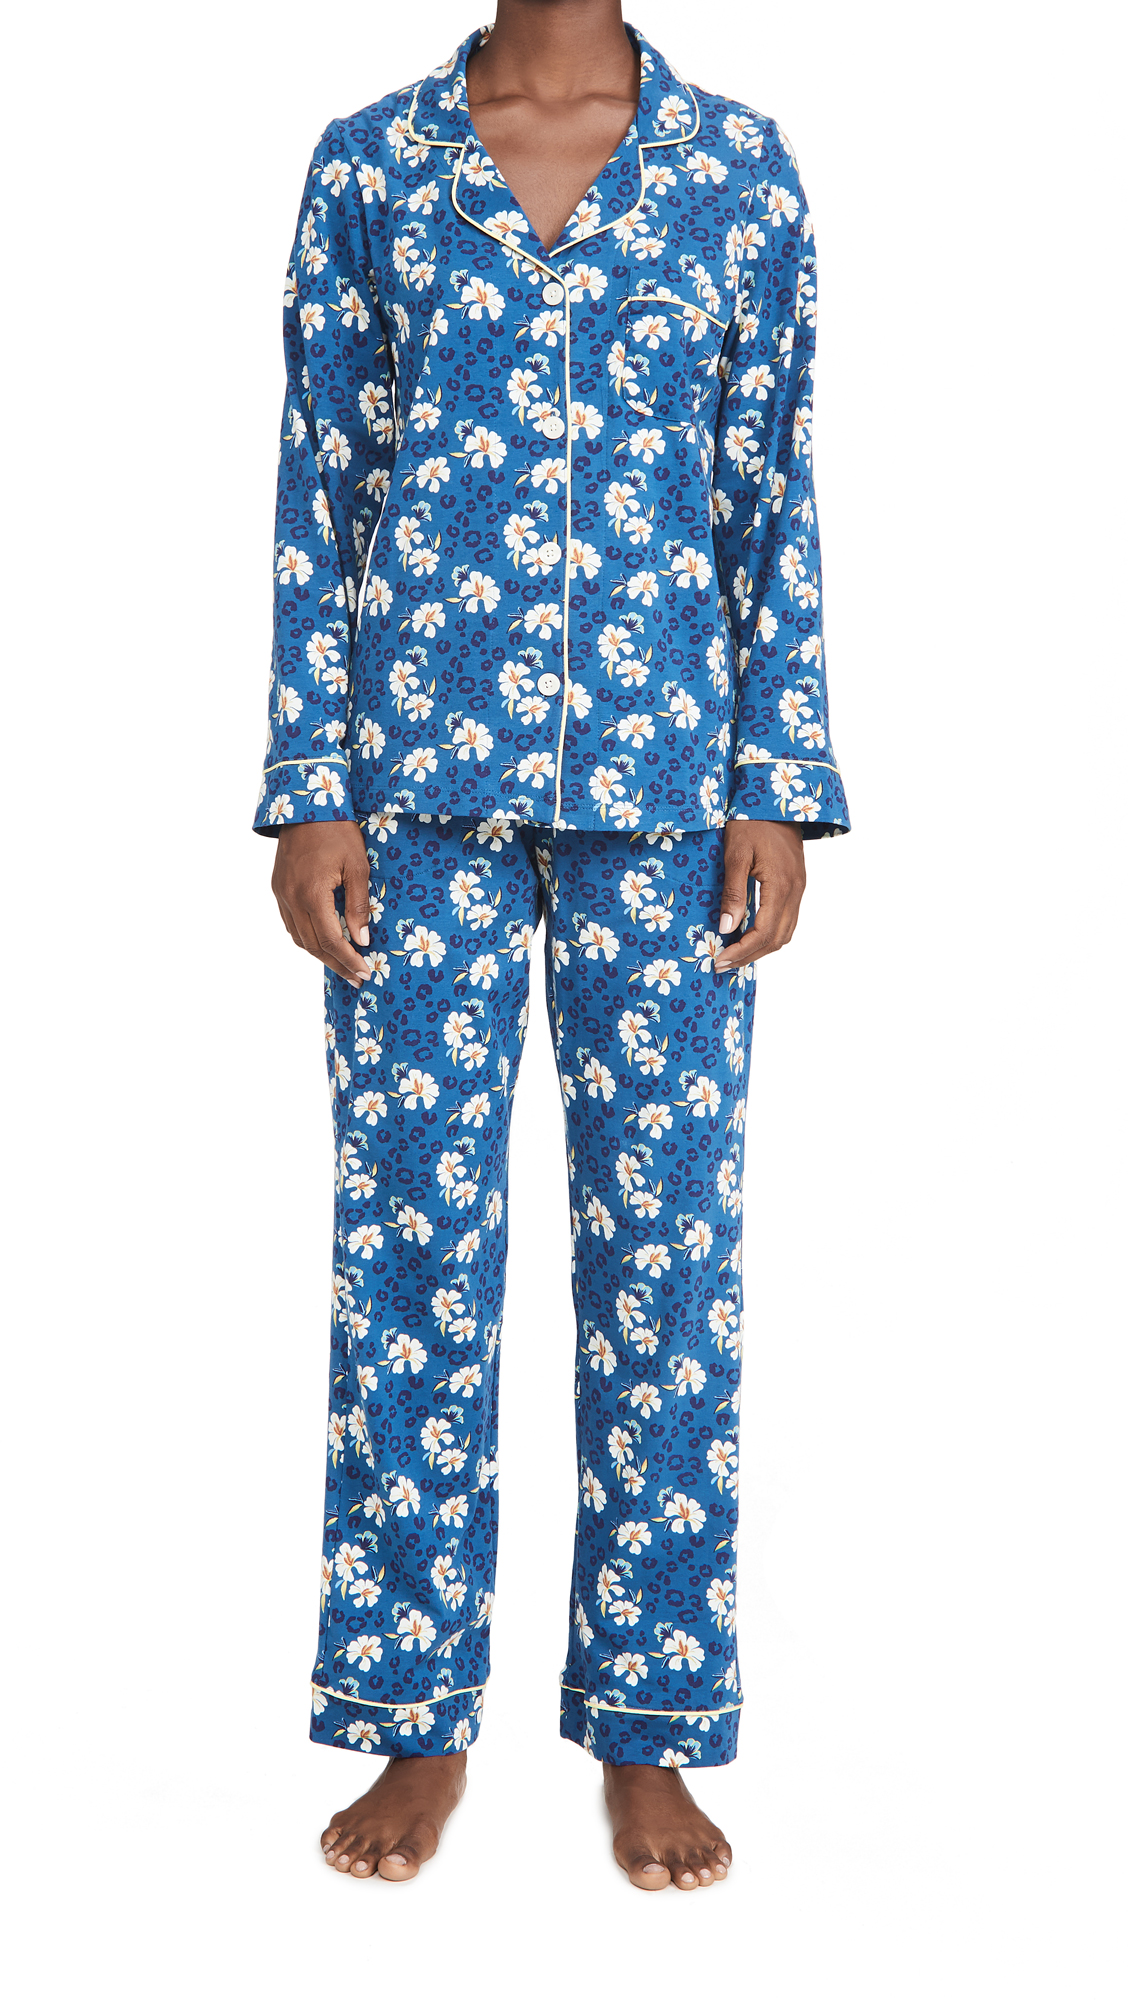 BedHead Pajamas Feline Floral Classic PJ Set